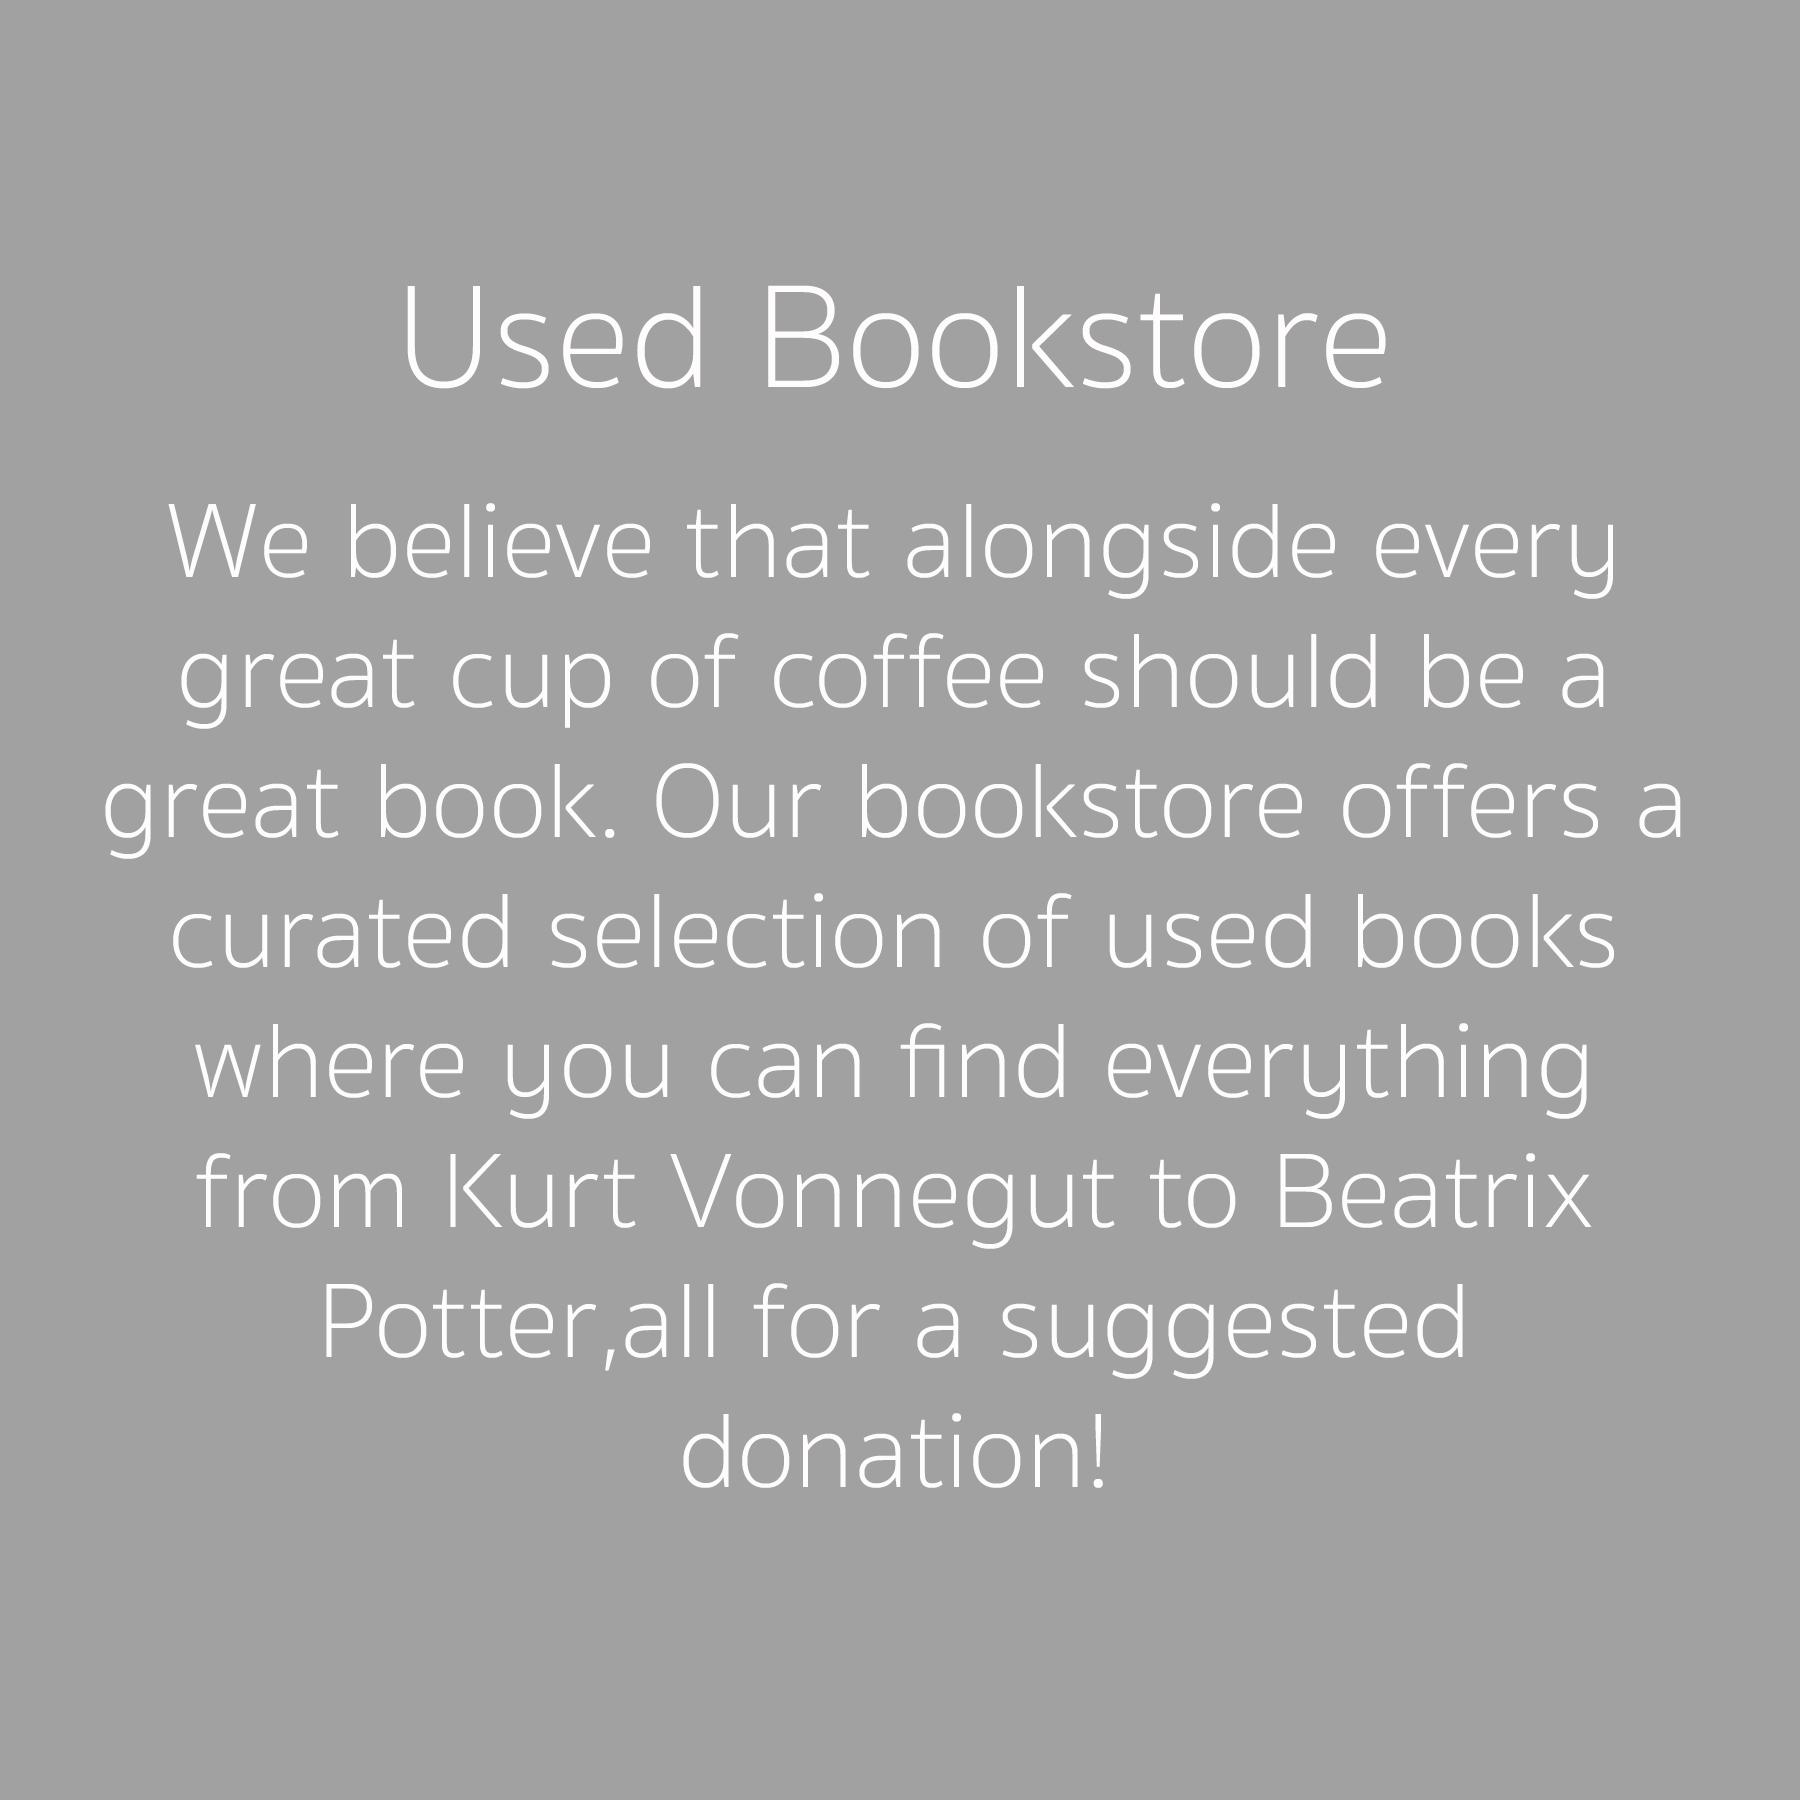 Used Bookstore.jpg